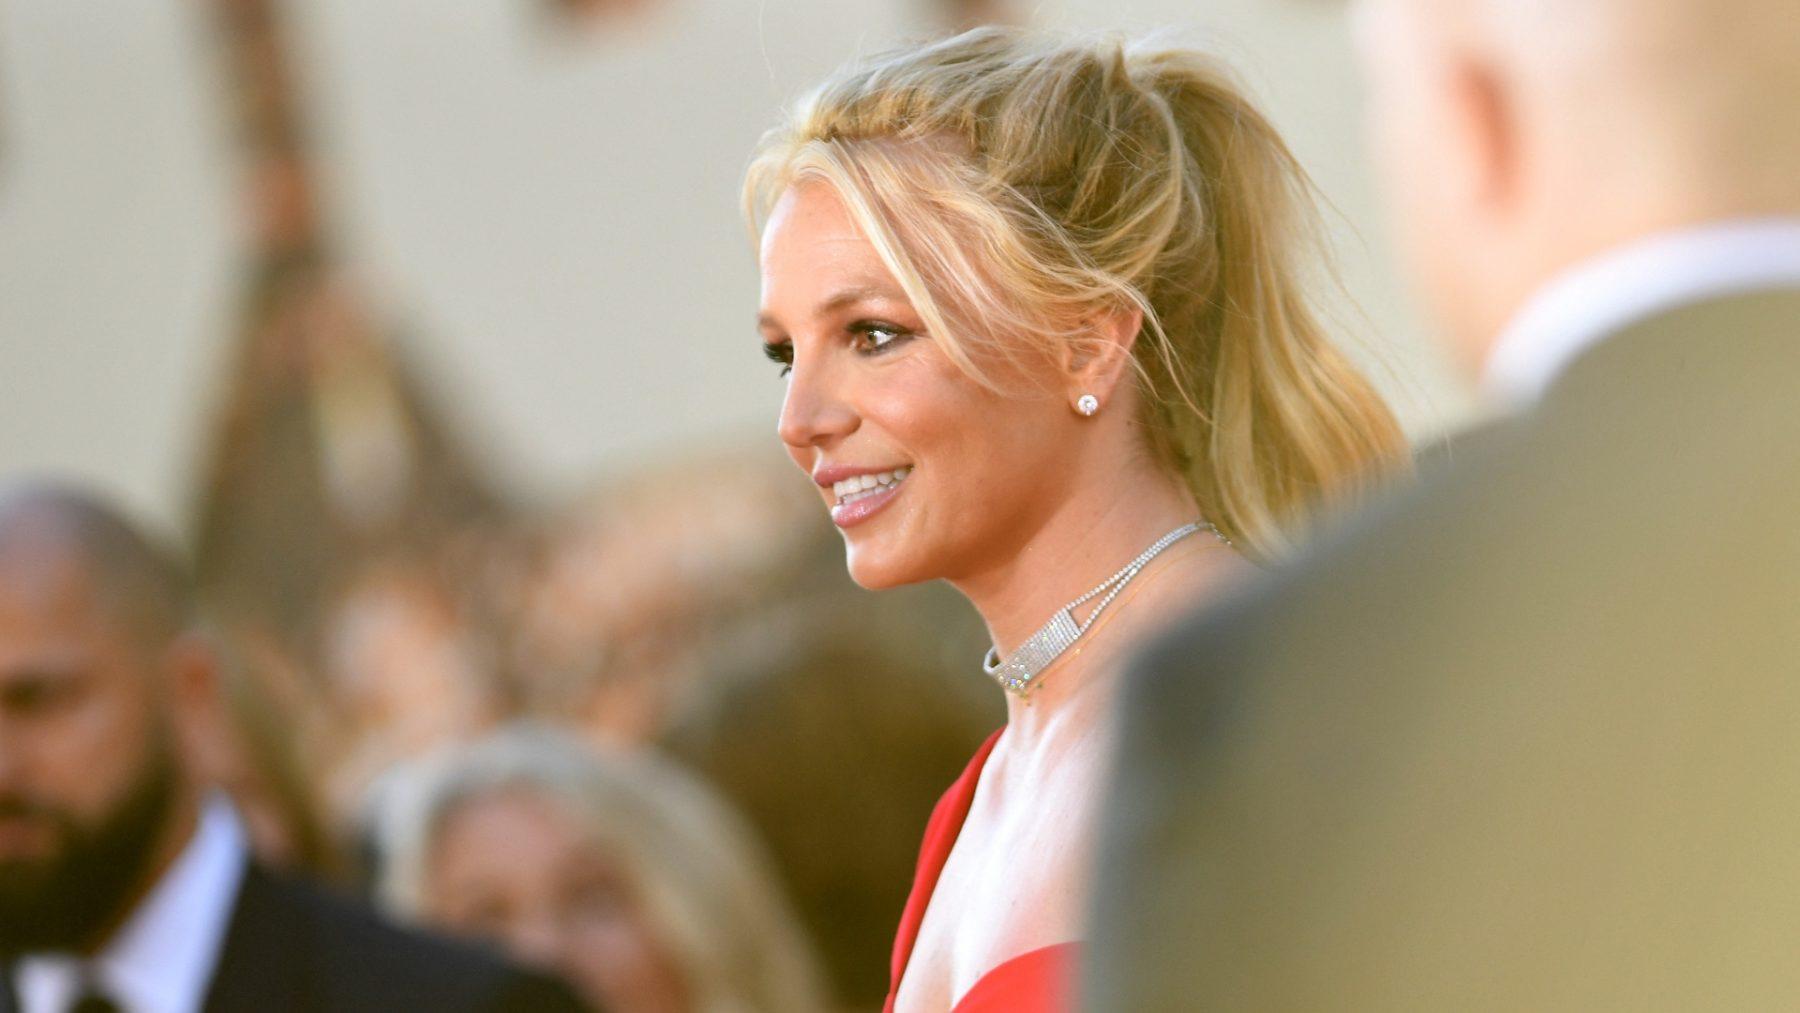 Nieuwe BBC-documentaire over Britney Spears begin mei op televisie